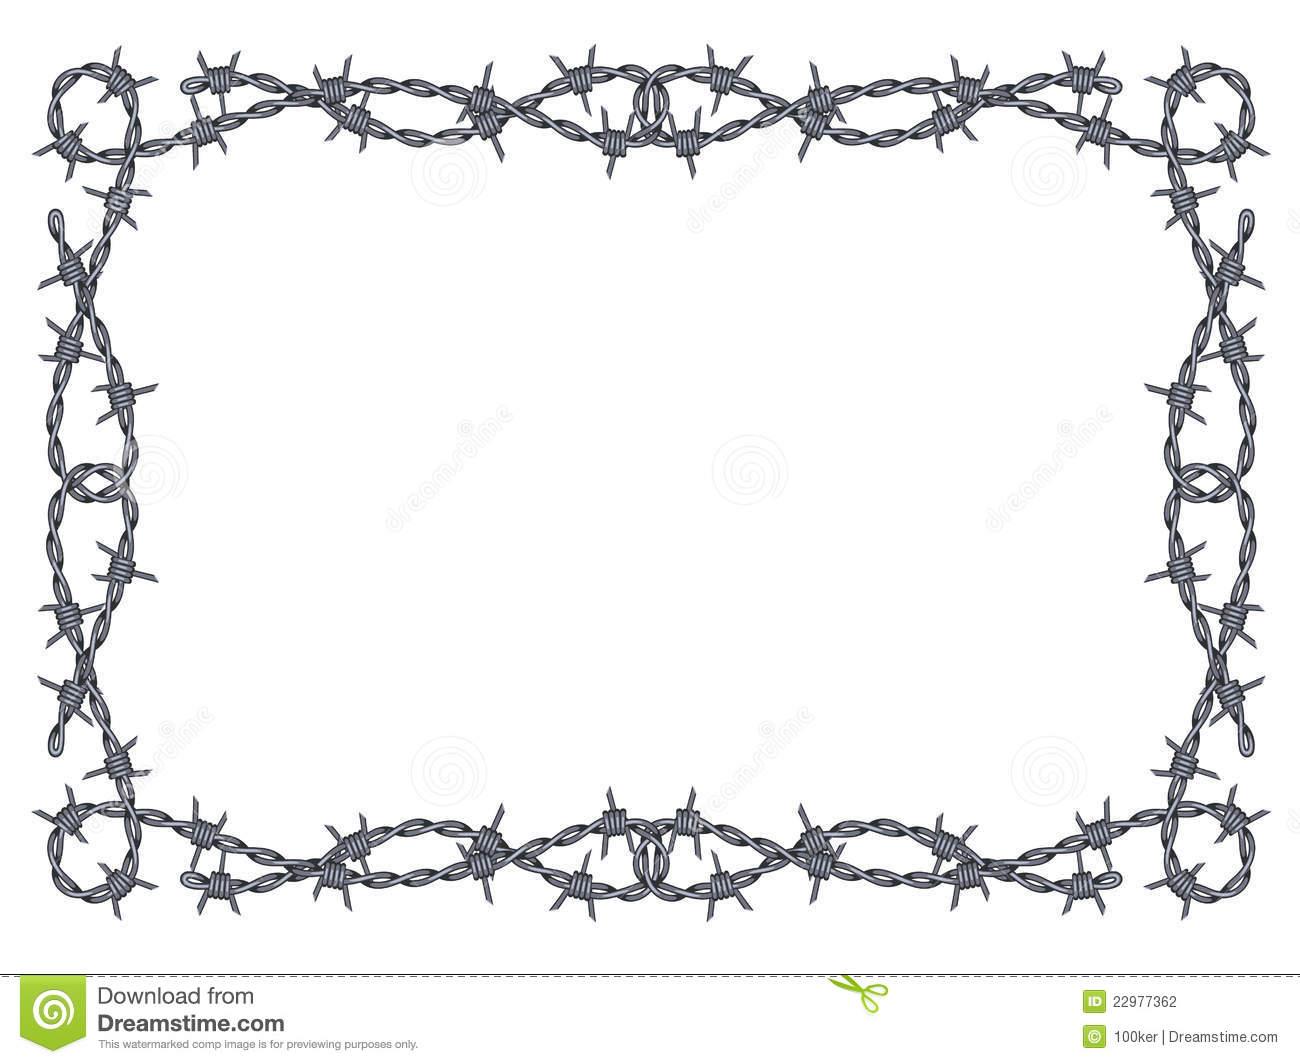 Barb wire clipart border.